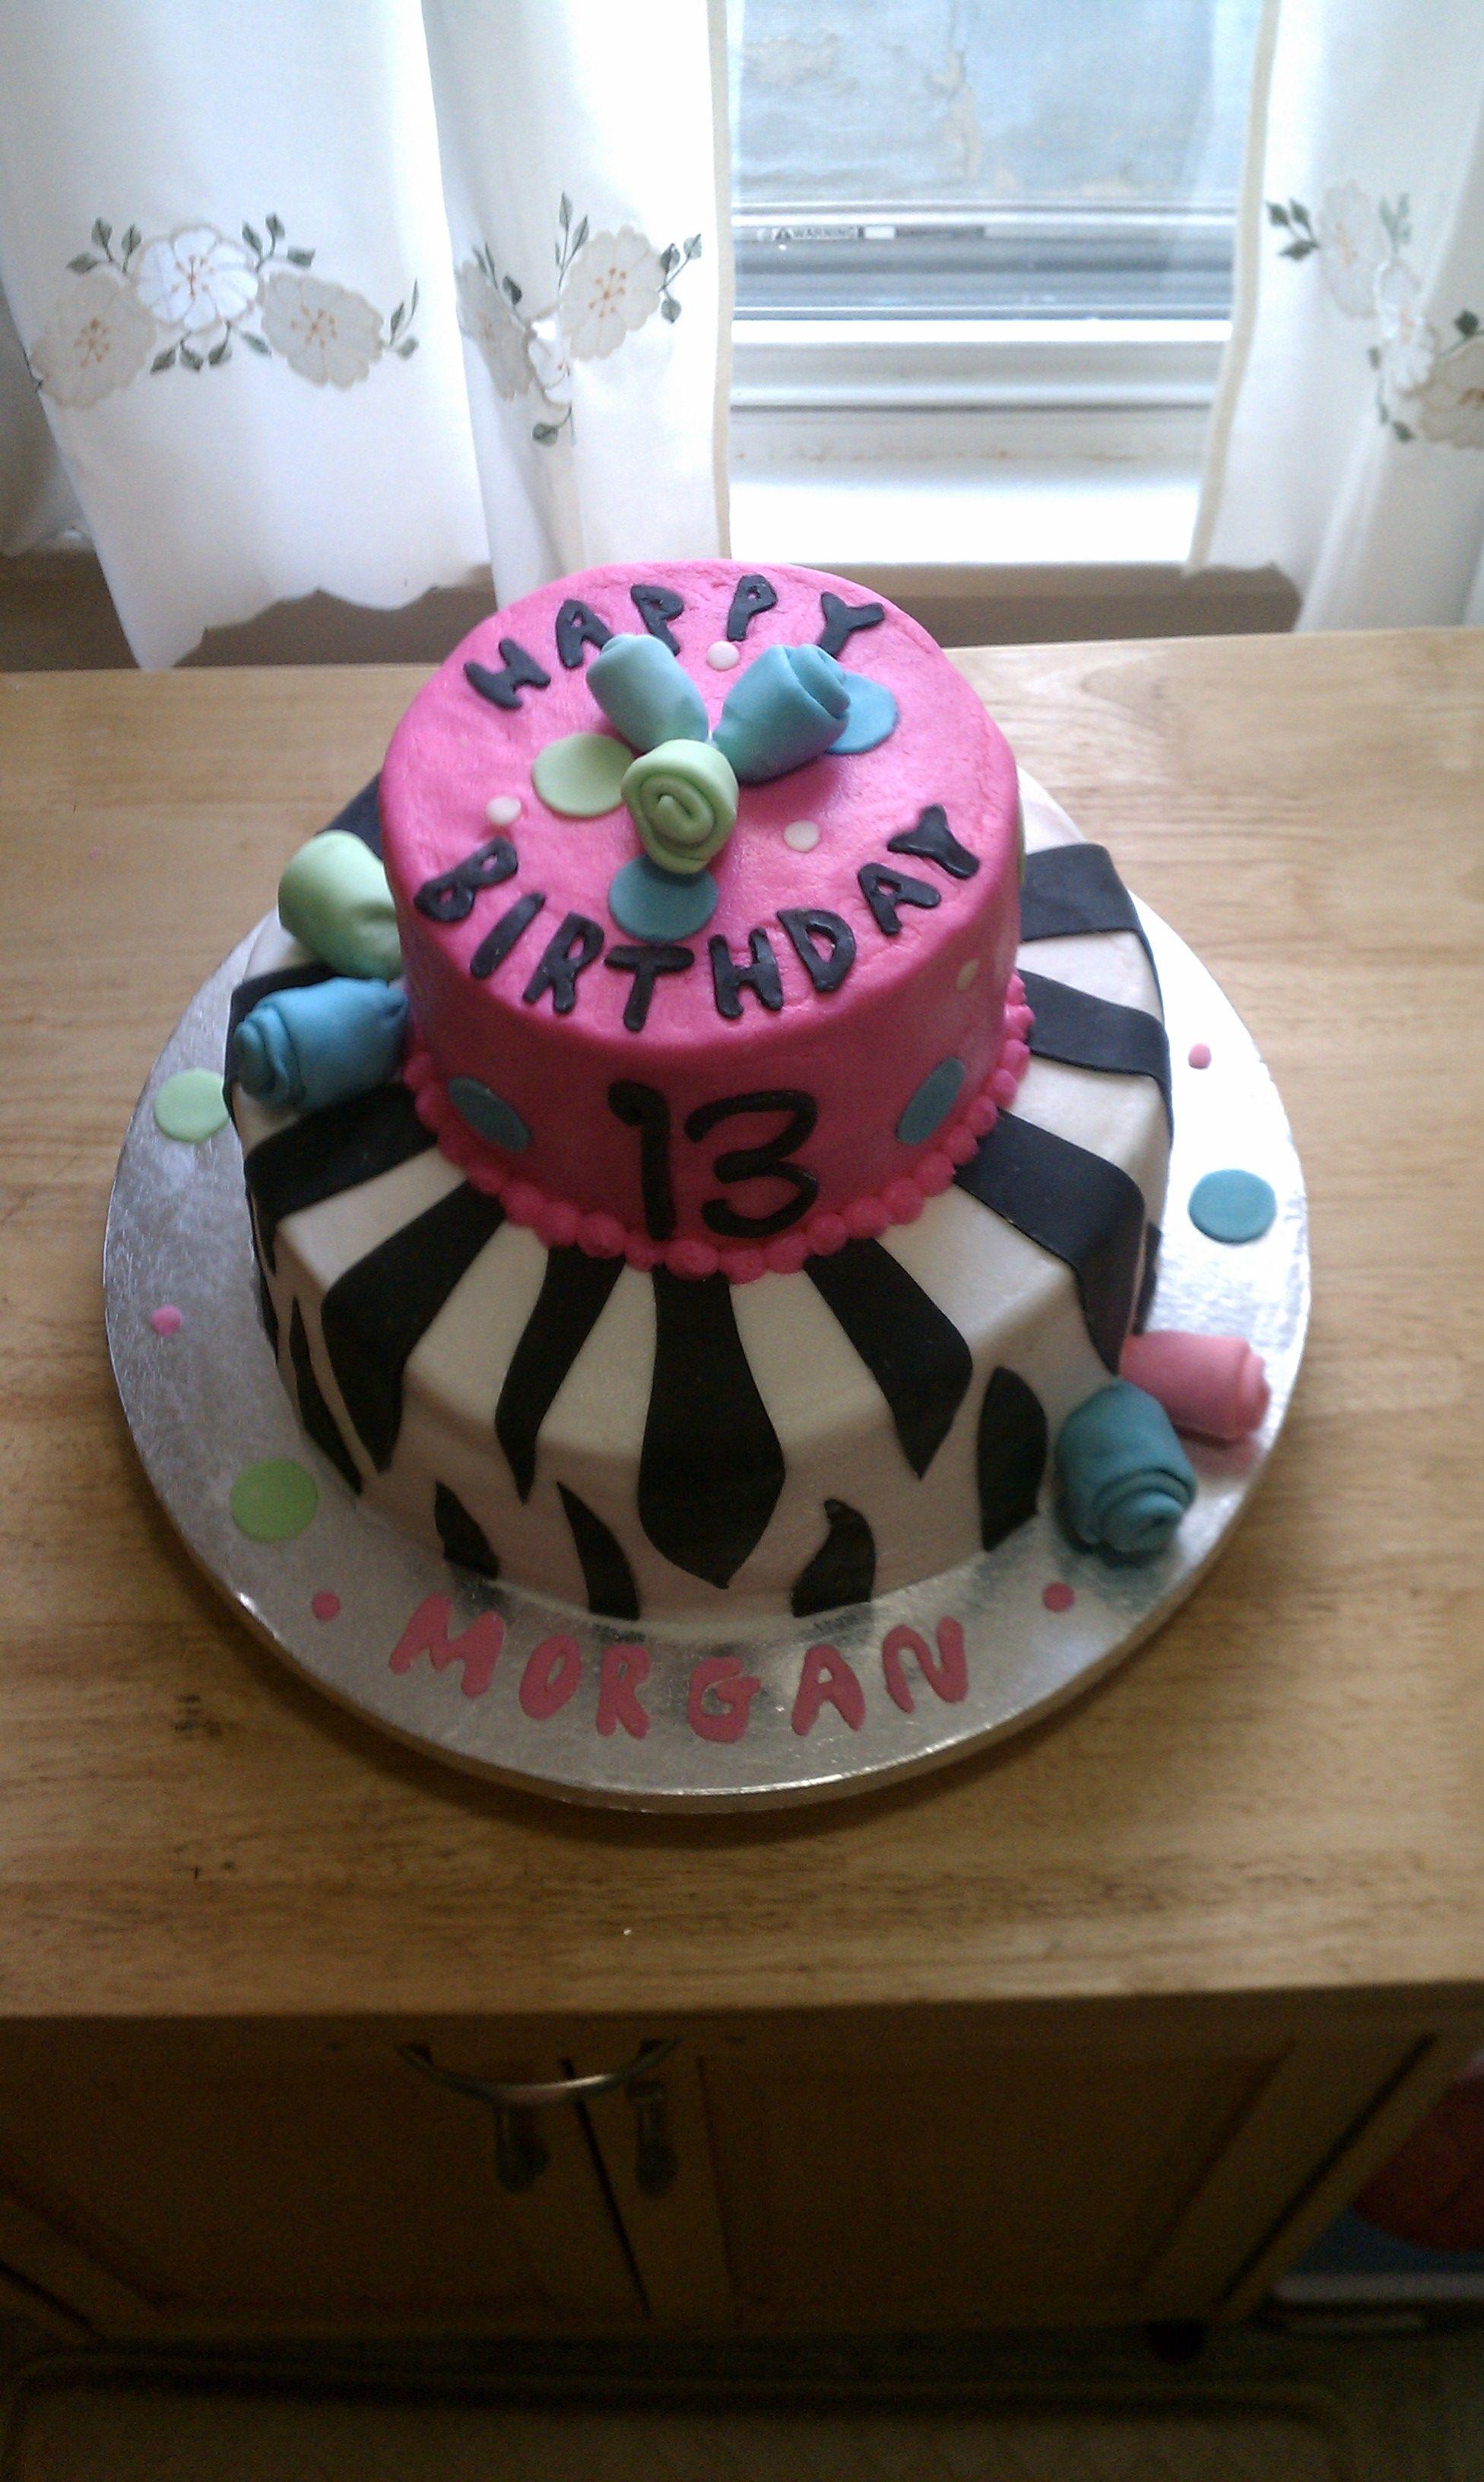 13th birthday cake cakes pinterest 13th birthday